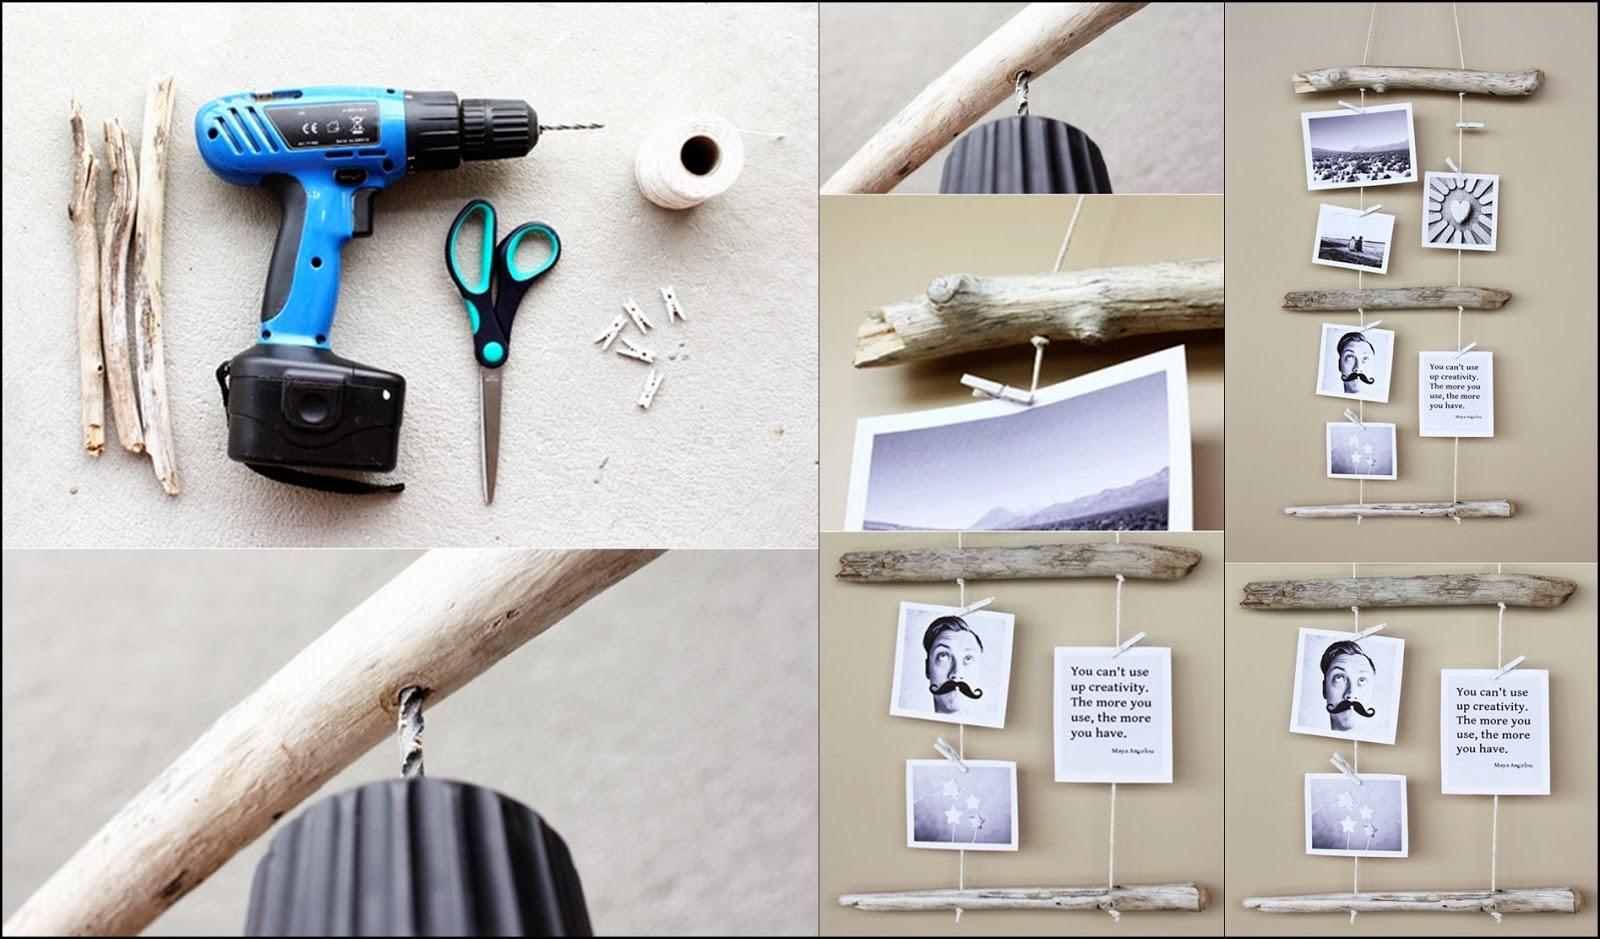 DIY Driftwood Photo Display DIY Craft Projects